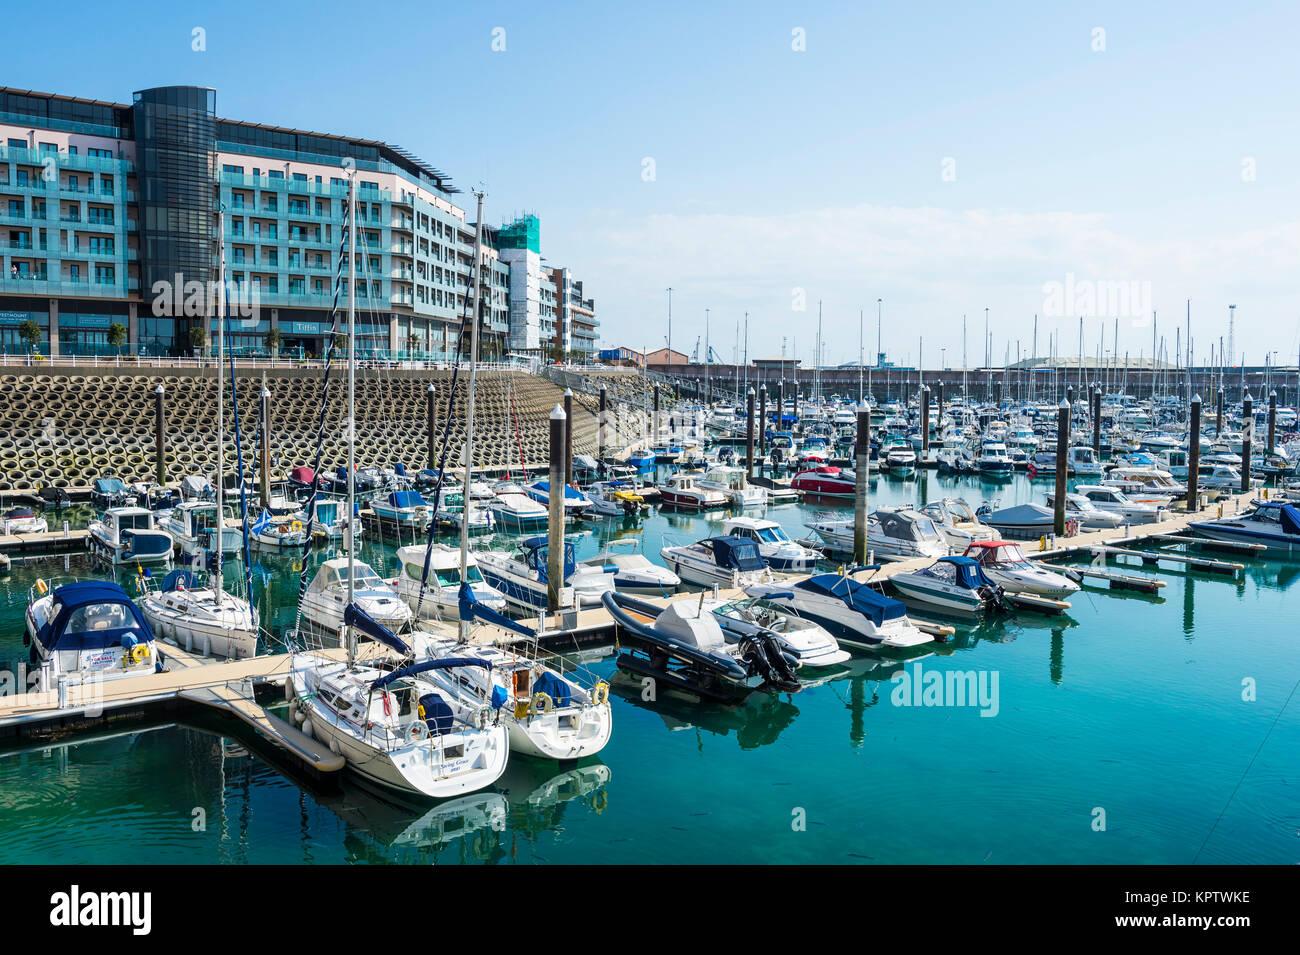 Modern harbour of St. Helier, Jersey, Channel Islands, United Kingdom - Stock Image